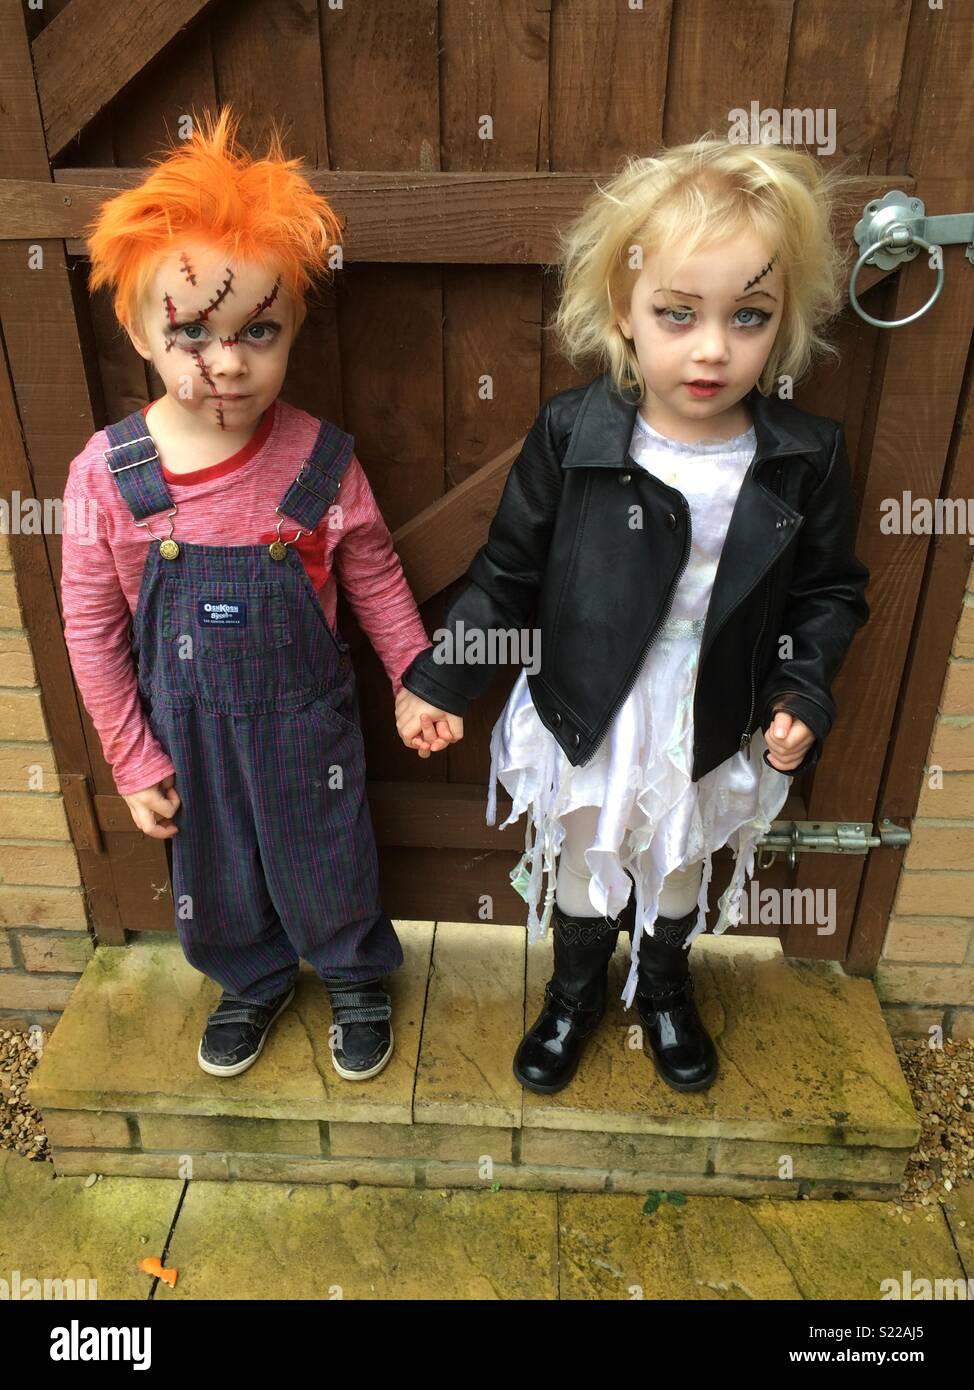 halloween costumes for children stock image